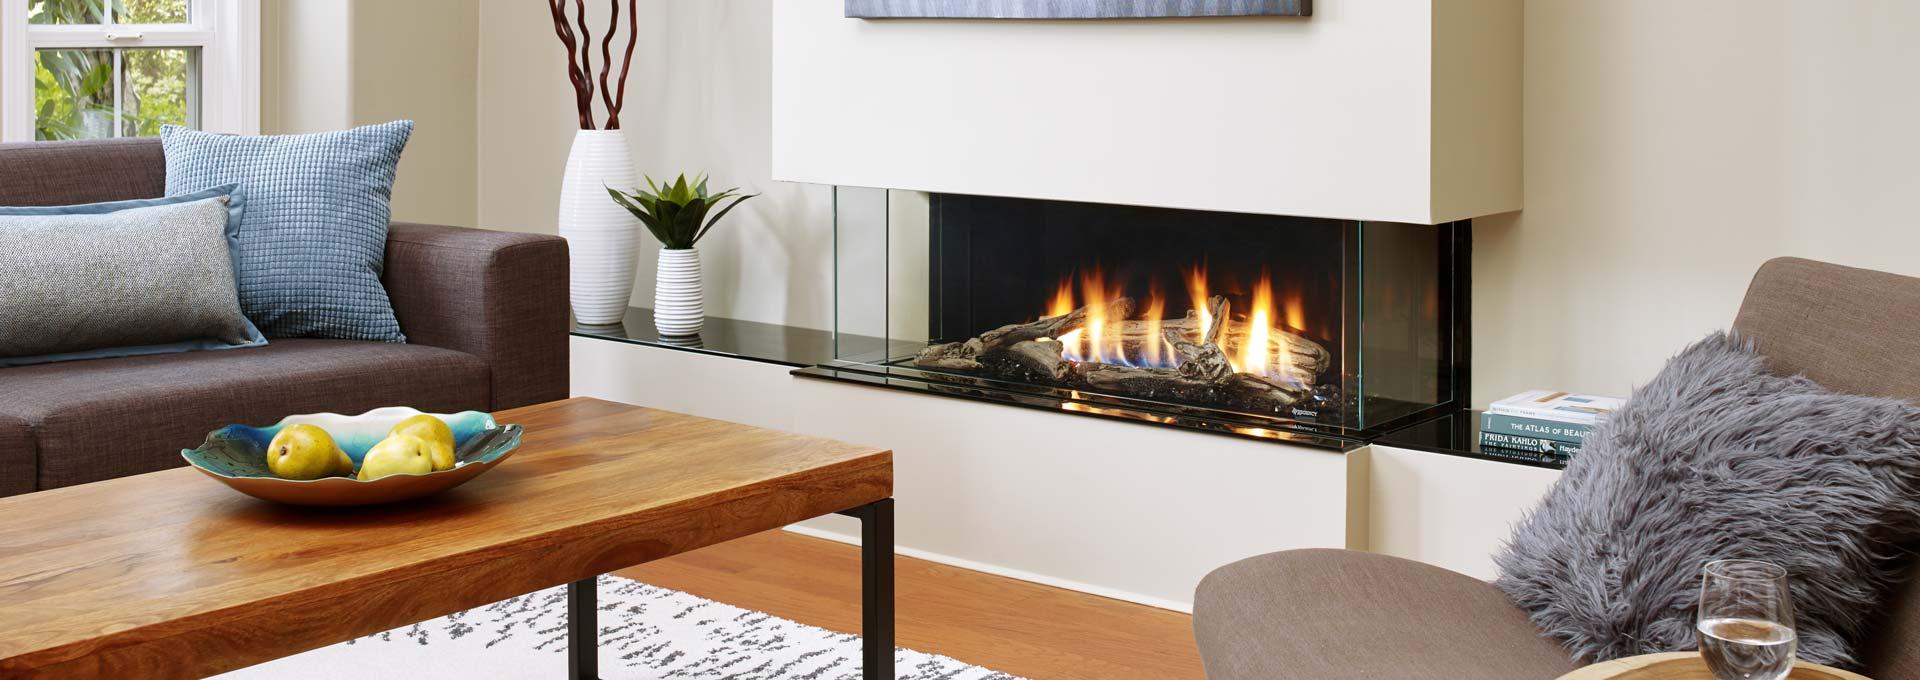 Regency City Series Bay Gas Fireplace